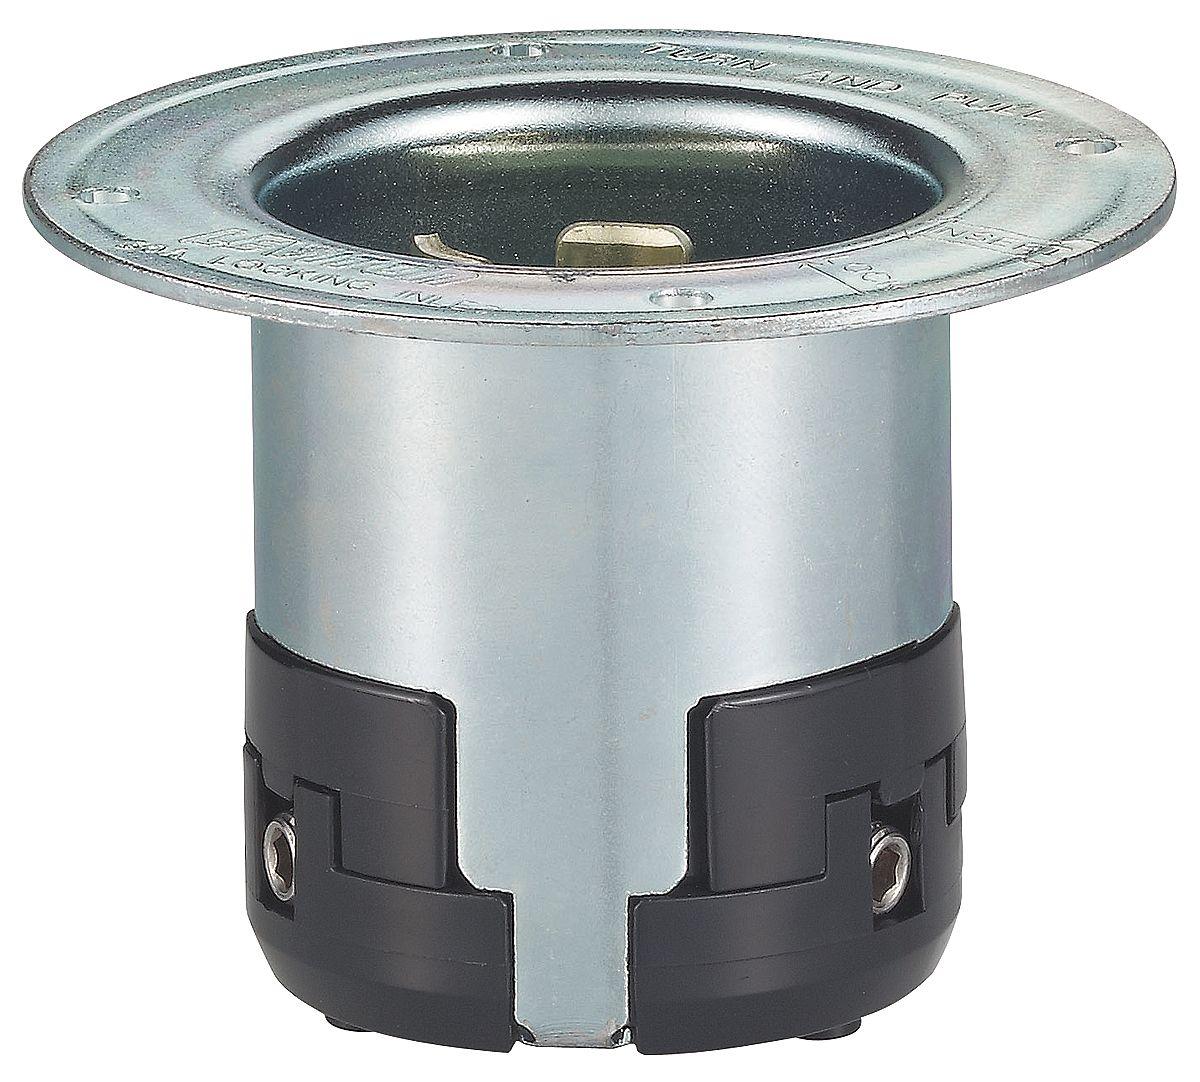 50A Flanged Locking Inlet 2P 3W 125VAC GY LEVITON 6377-CR